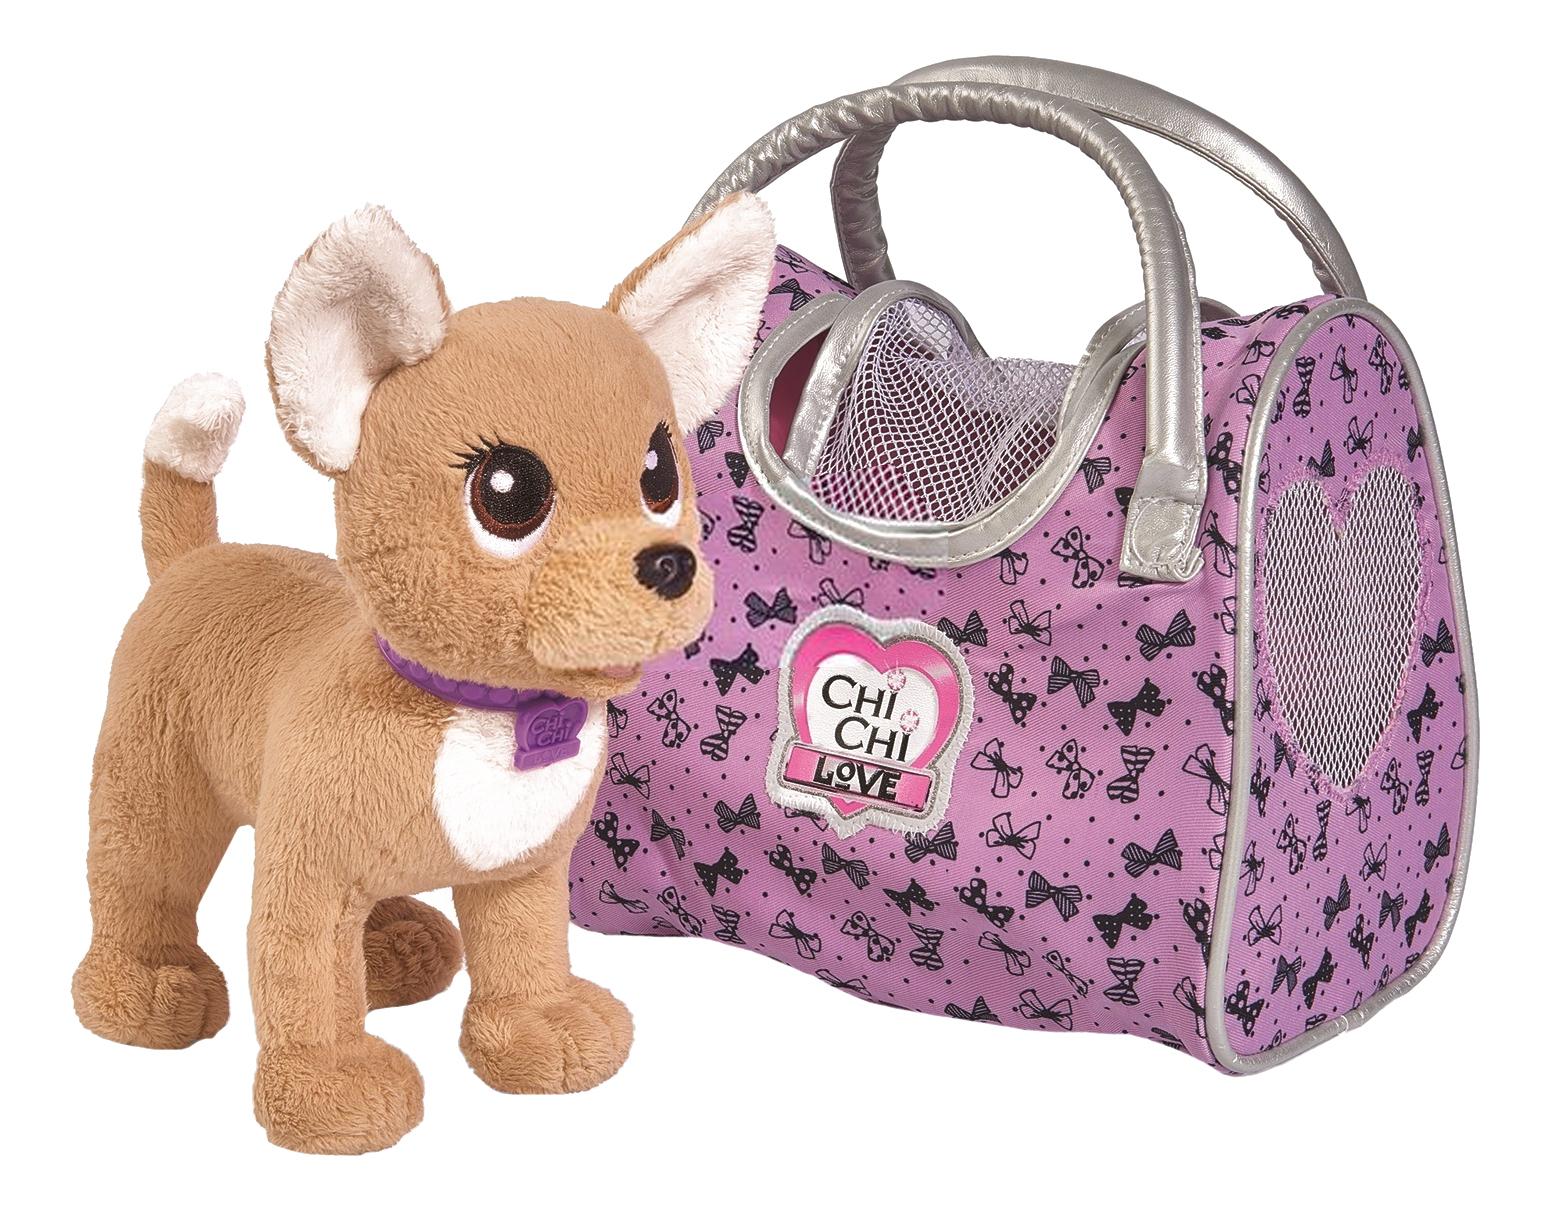 Мягкая игрушка Chi Chi Love собачка Путешественница с сумкой-переноской фото